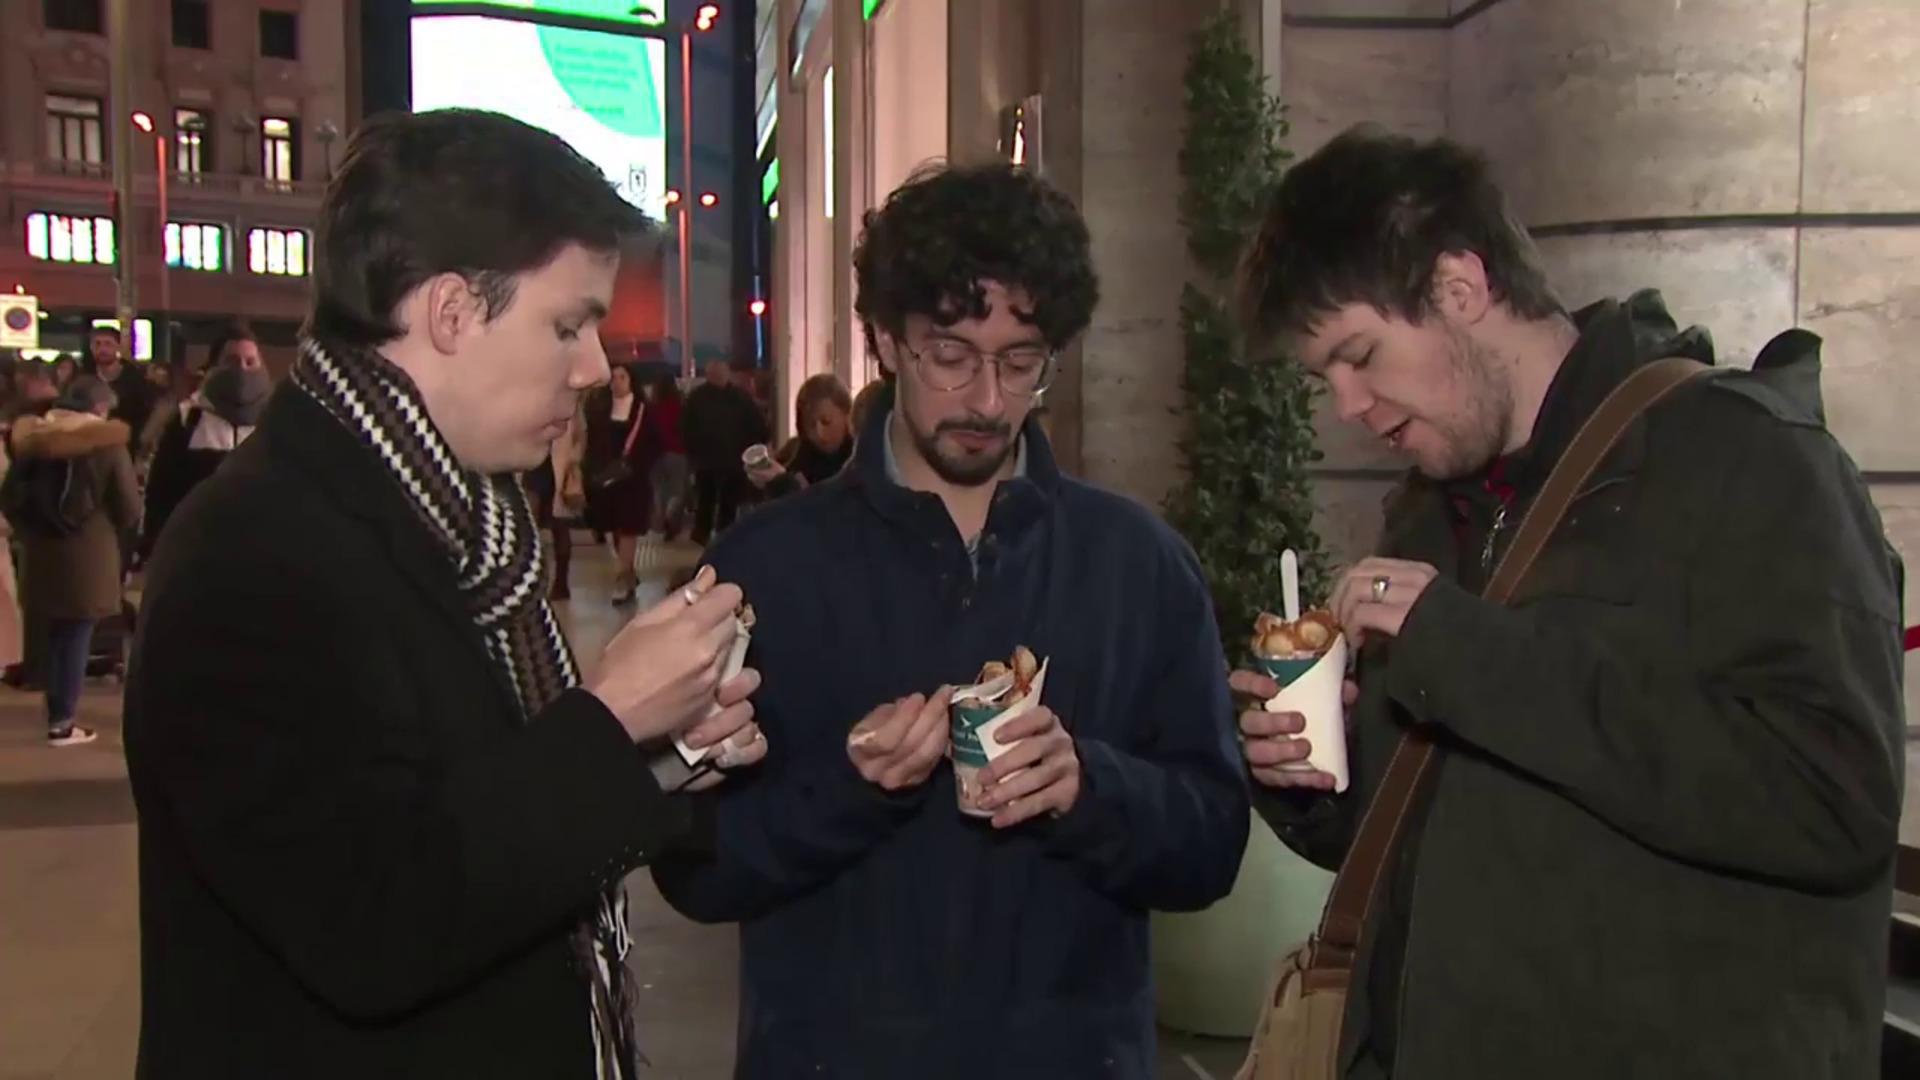 El Año Nuevo Chino se celebra en pleno centro de Madrid